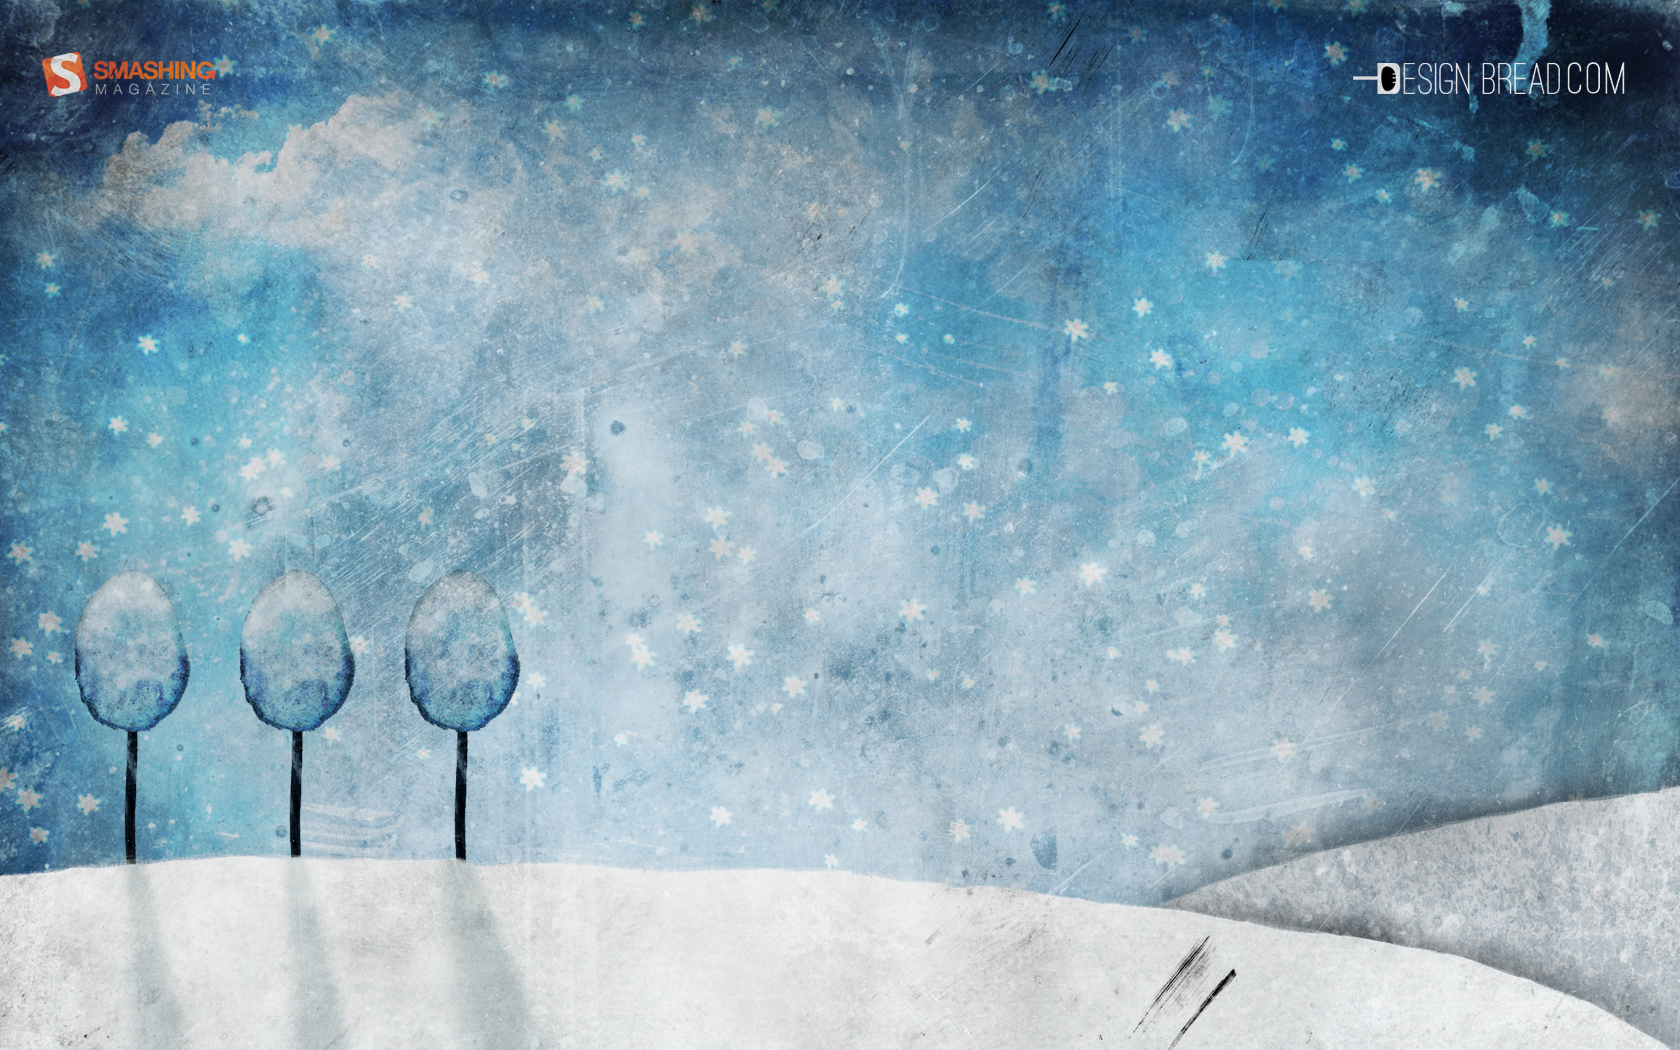 desktop wallpapers christmas edition december 2011